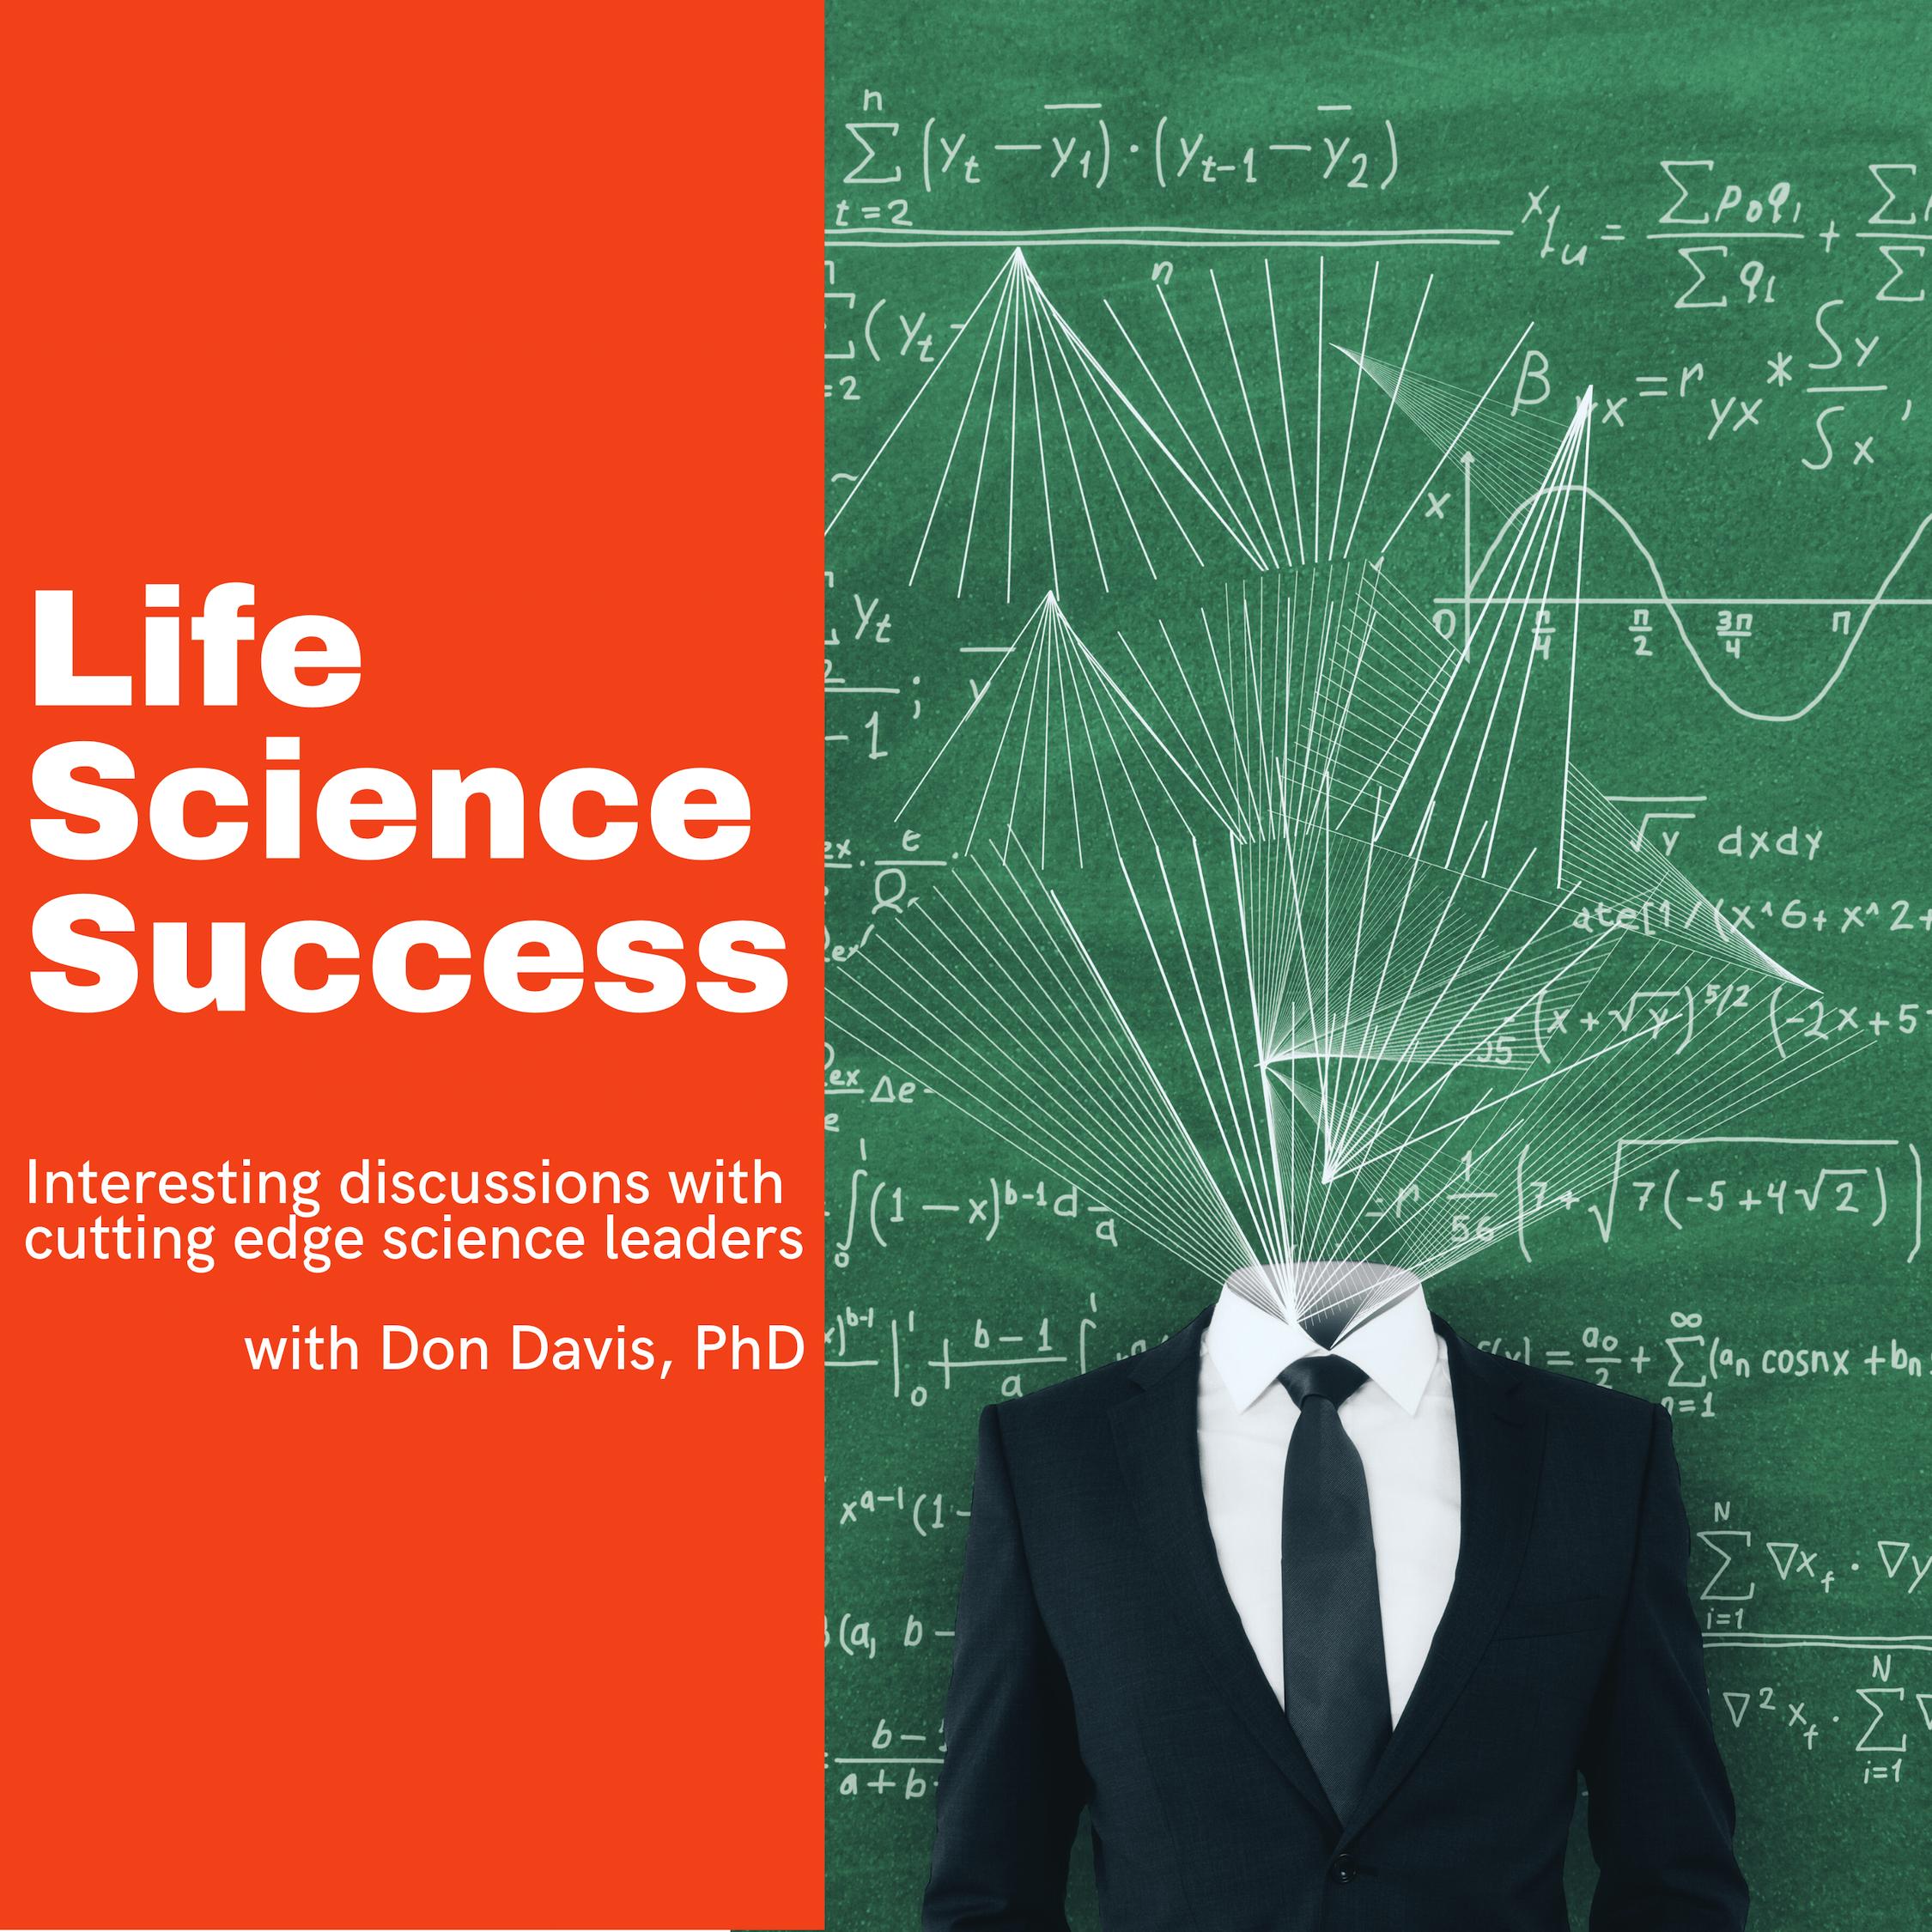 Life Science Success